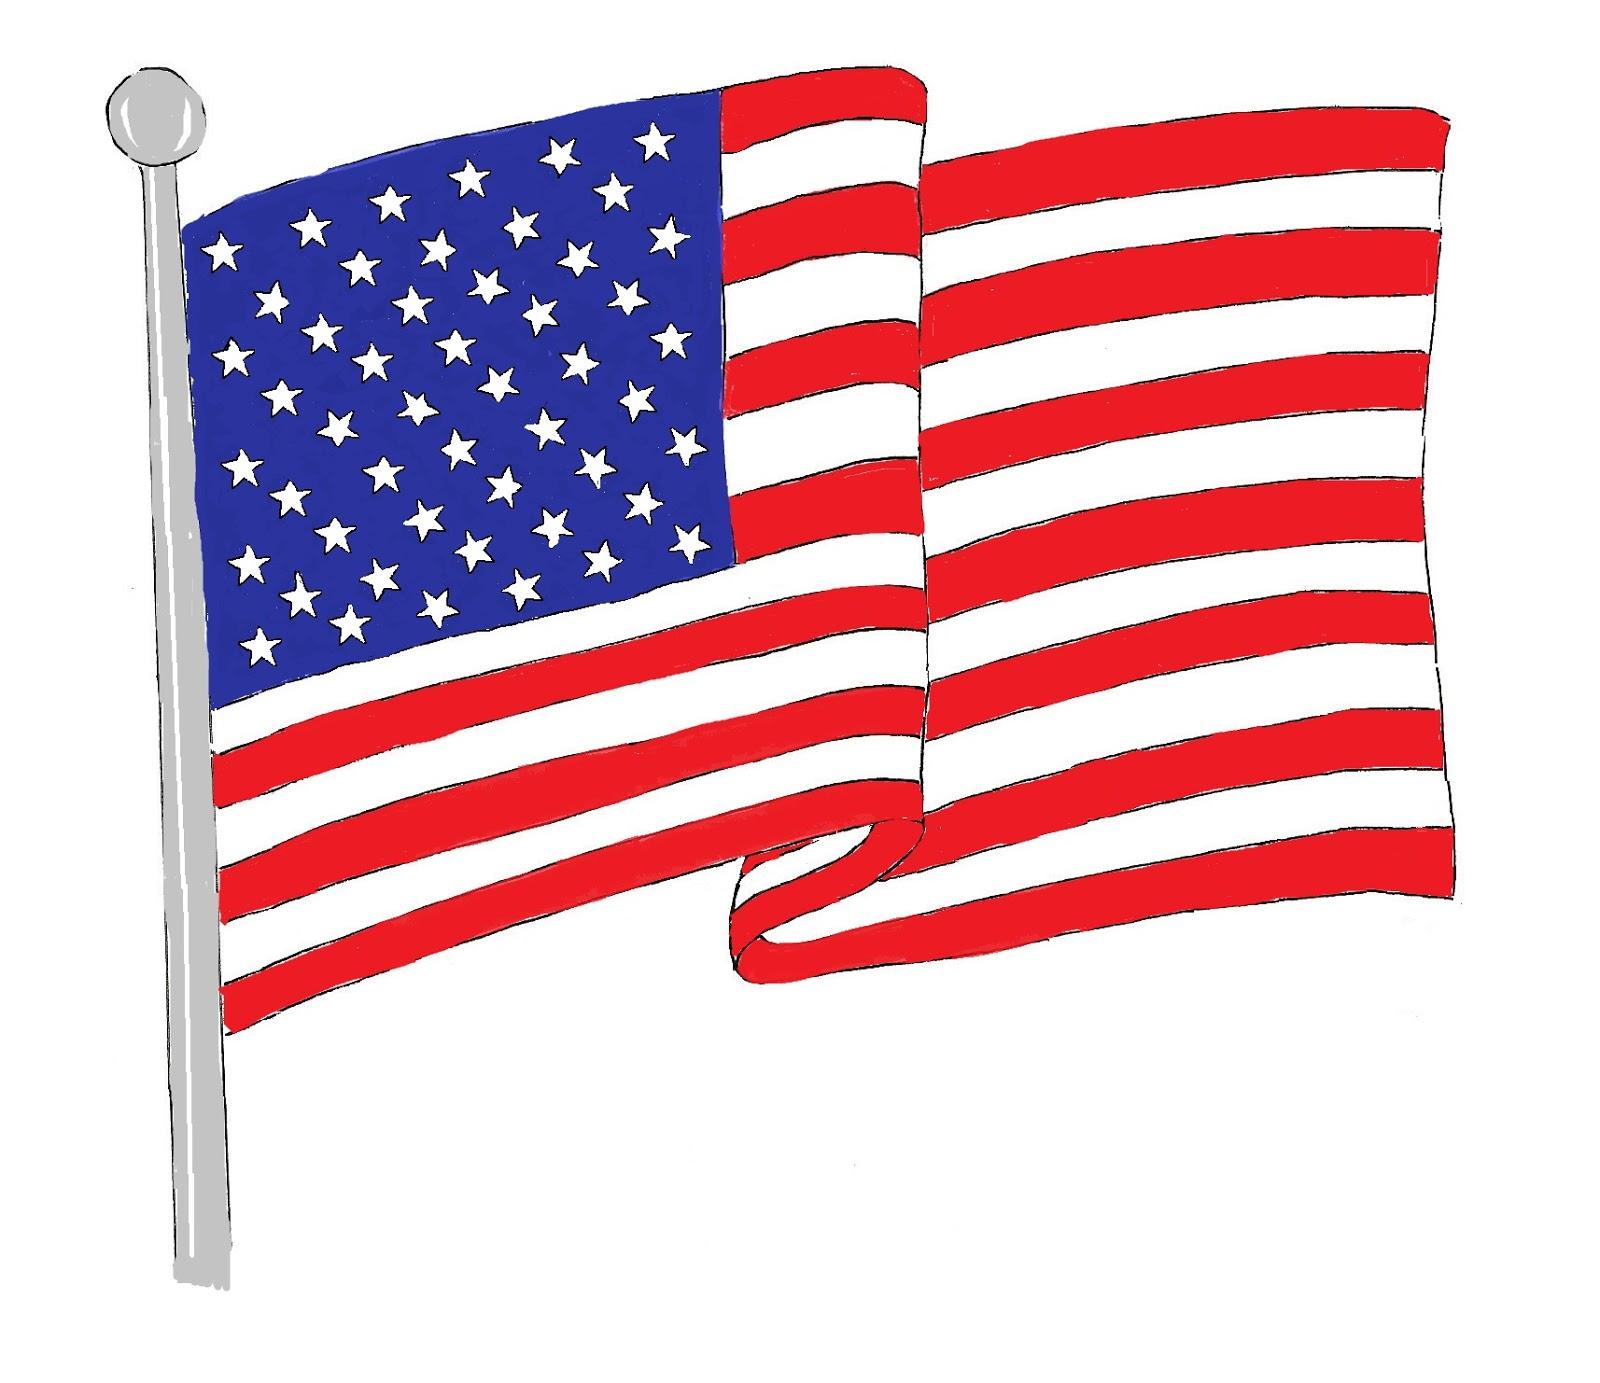 18 Waving American Flag Clip Art Free Cl-18 Waving American Flag Clip Art Free Cliparts That You Can Download-2